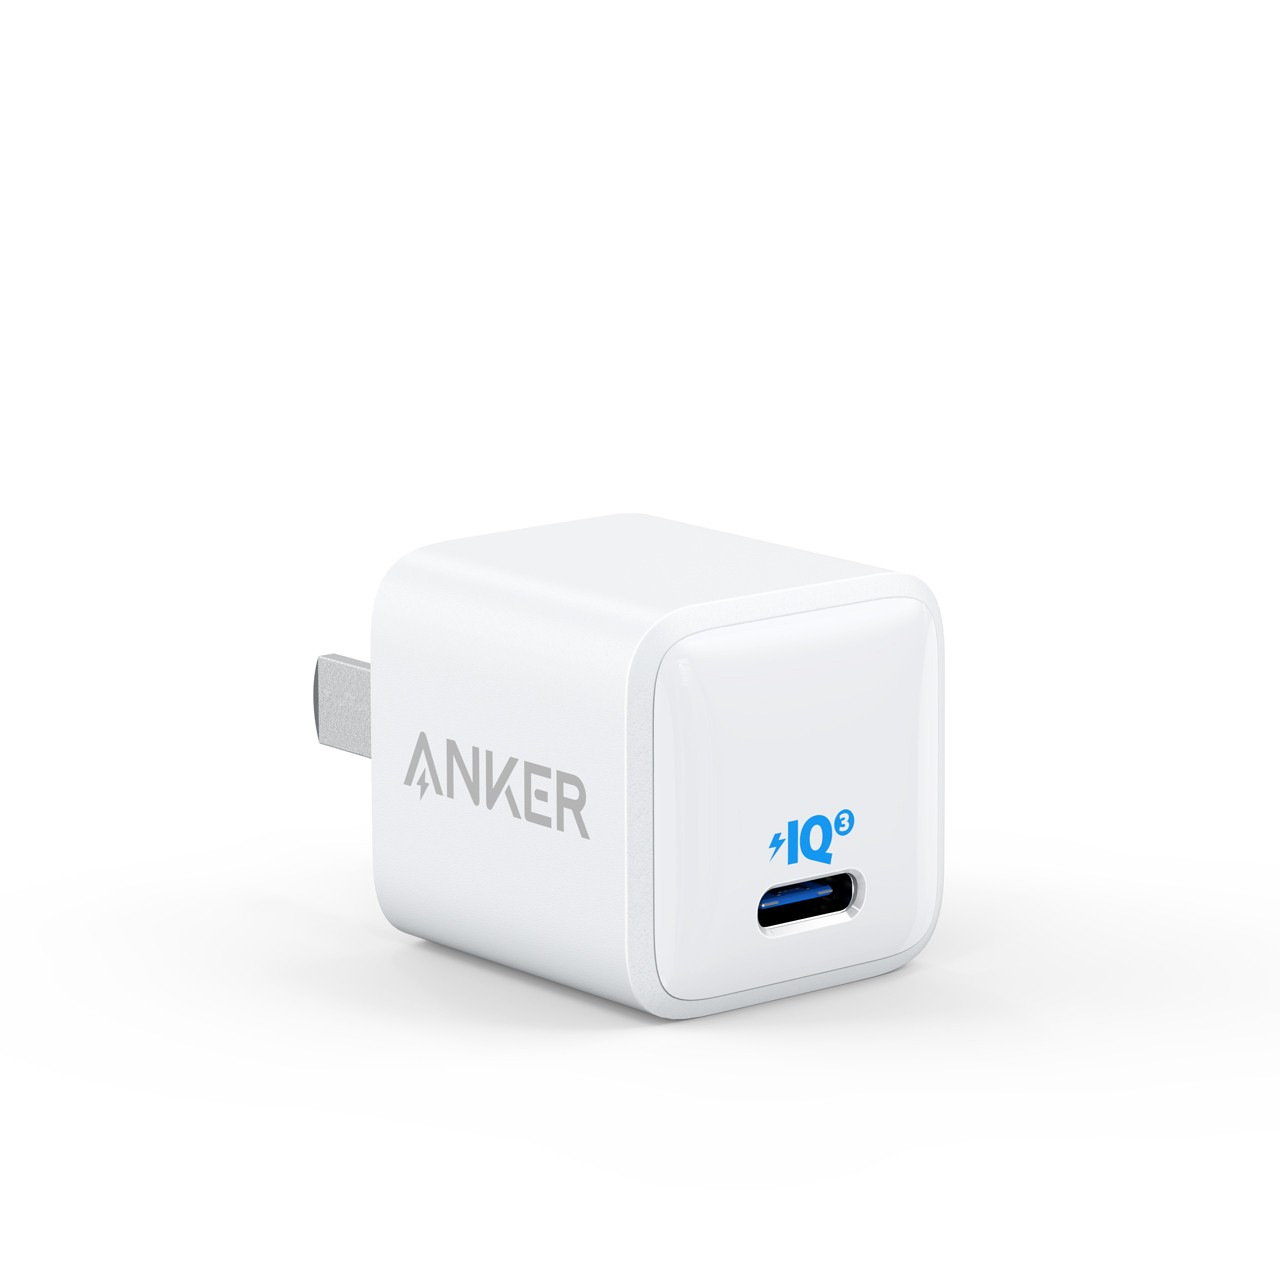 Anker 安克 PowerPort Nano 20W PD 充电器